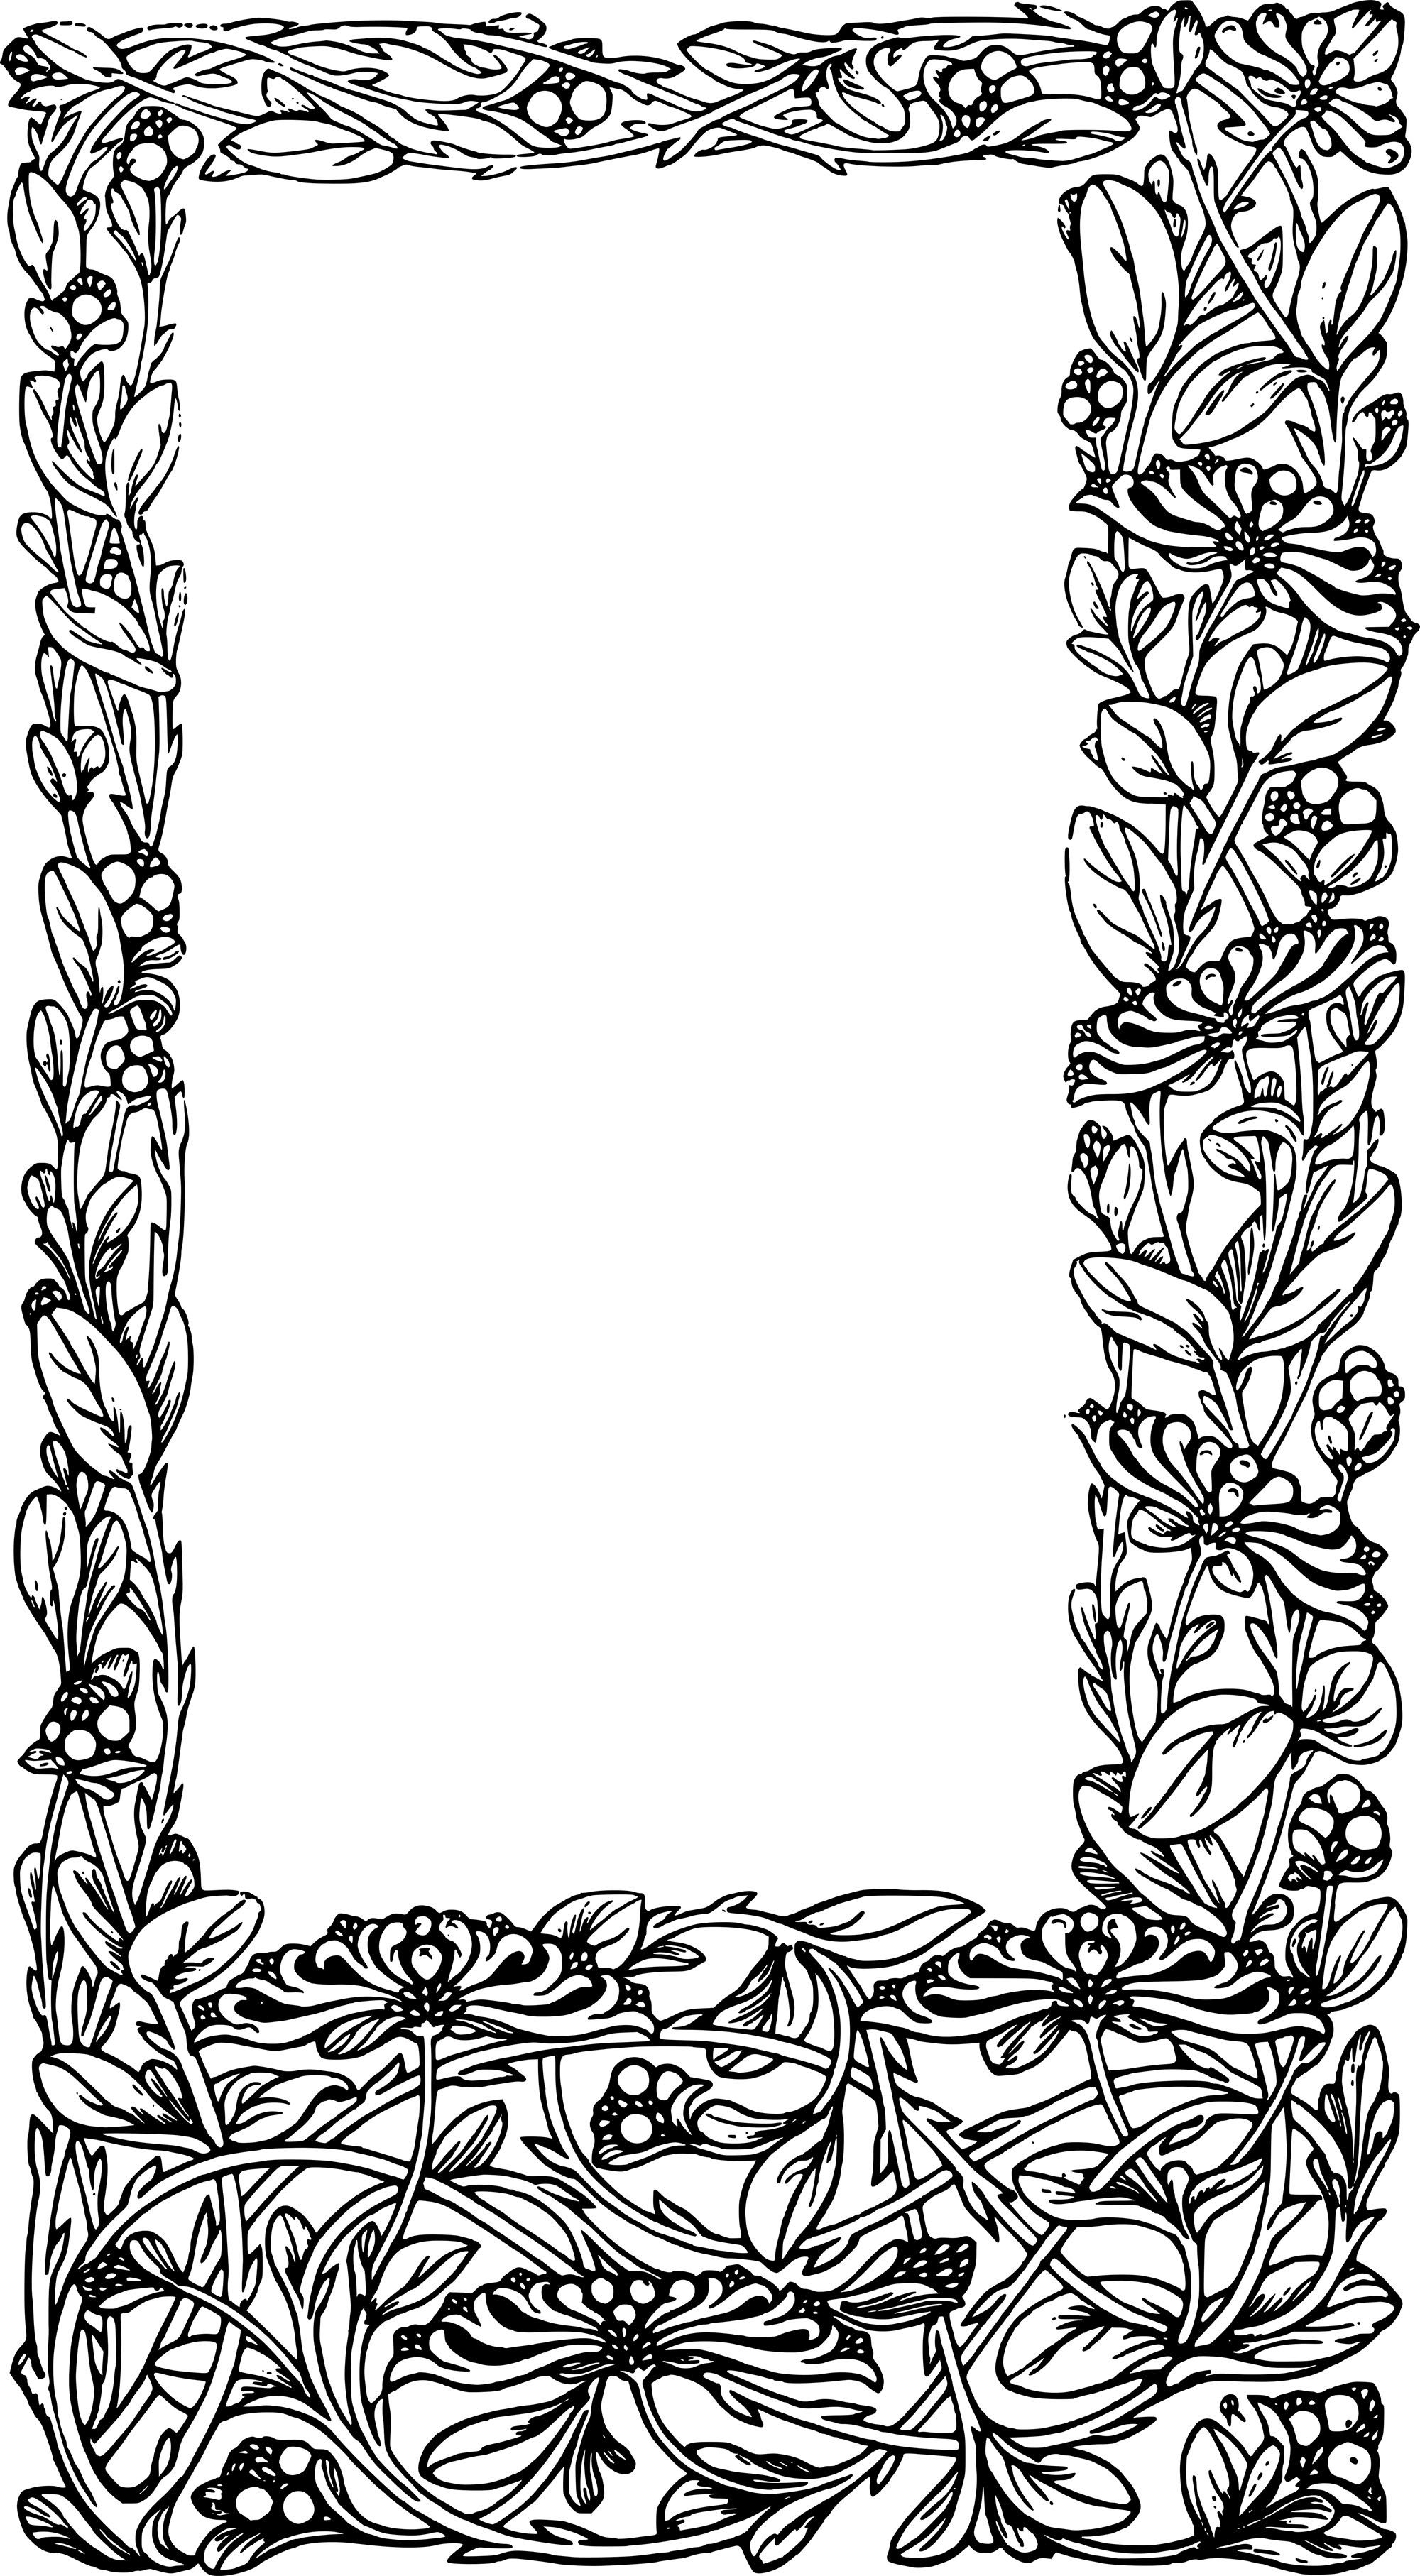 Pin by Chris Du Preez on Outydse grafika | Flower coloring ...